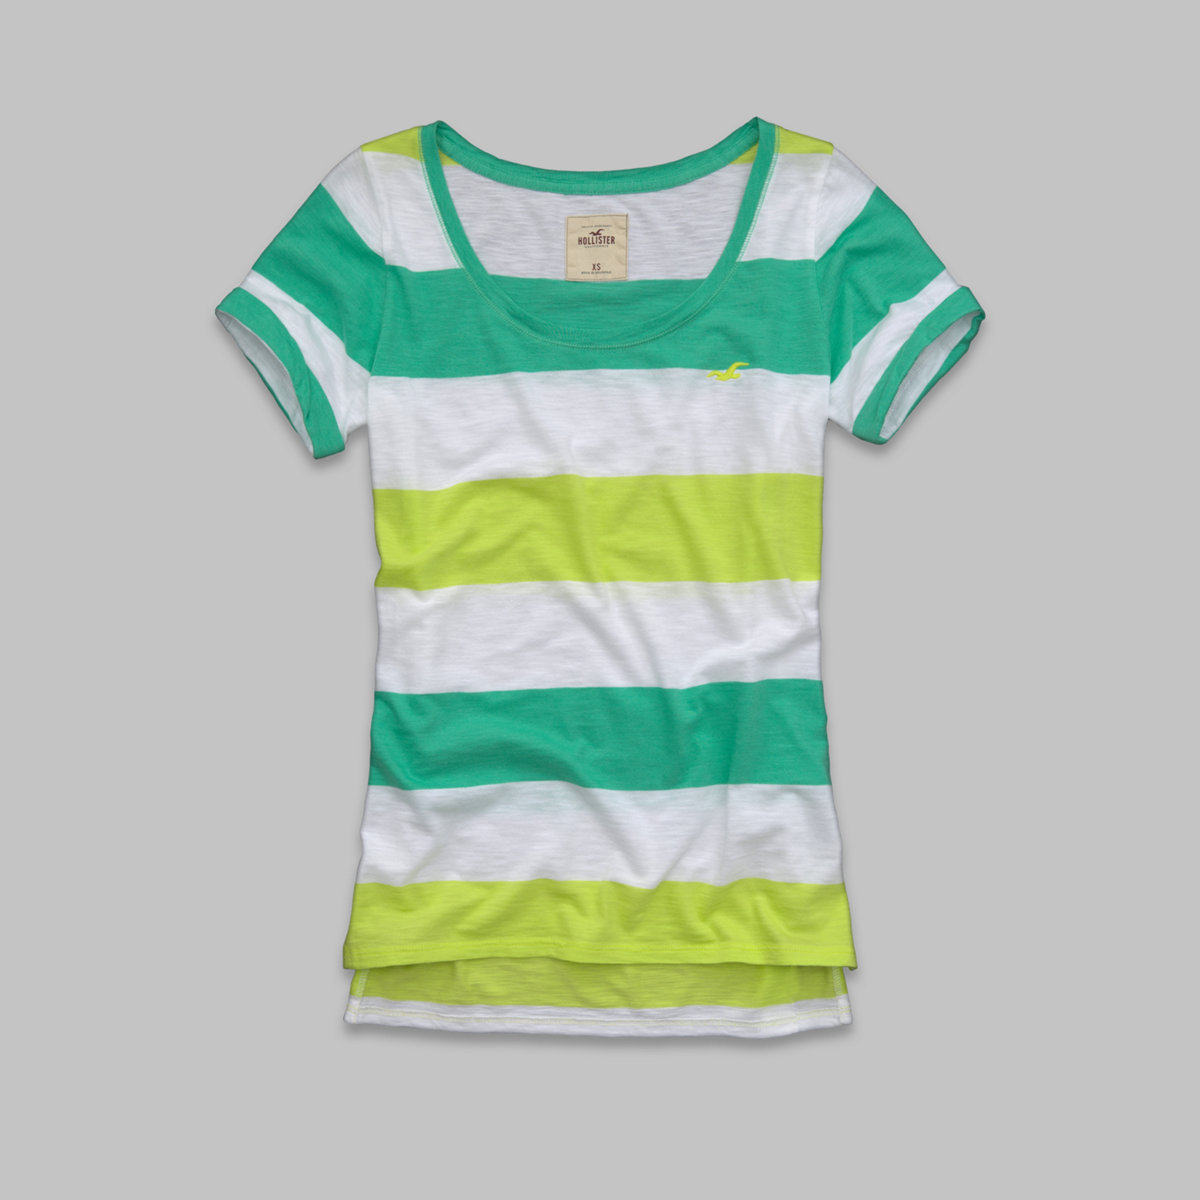 Laguna Niguel T-Shirt